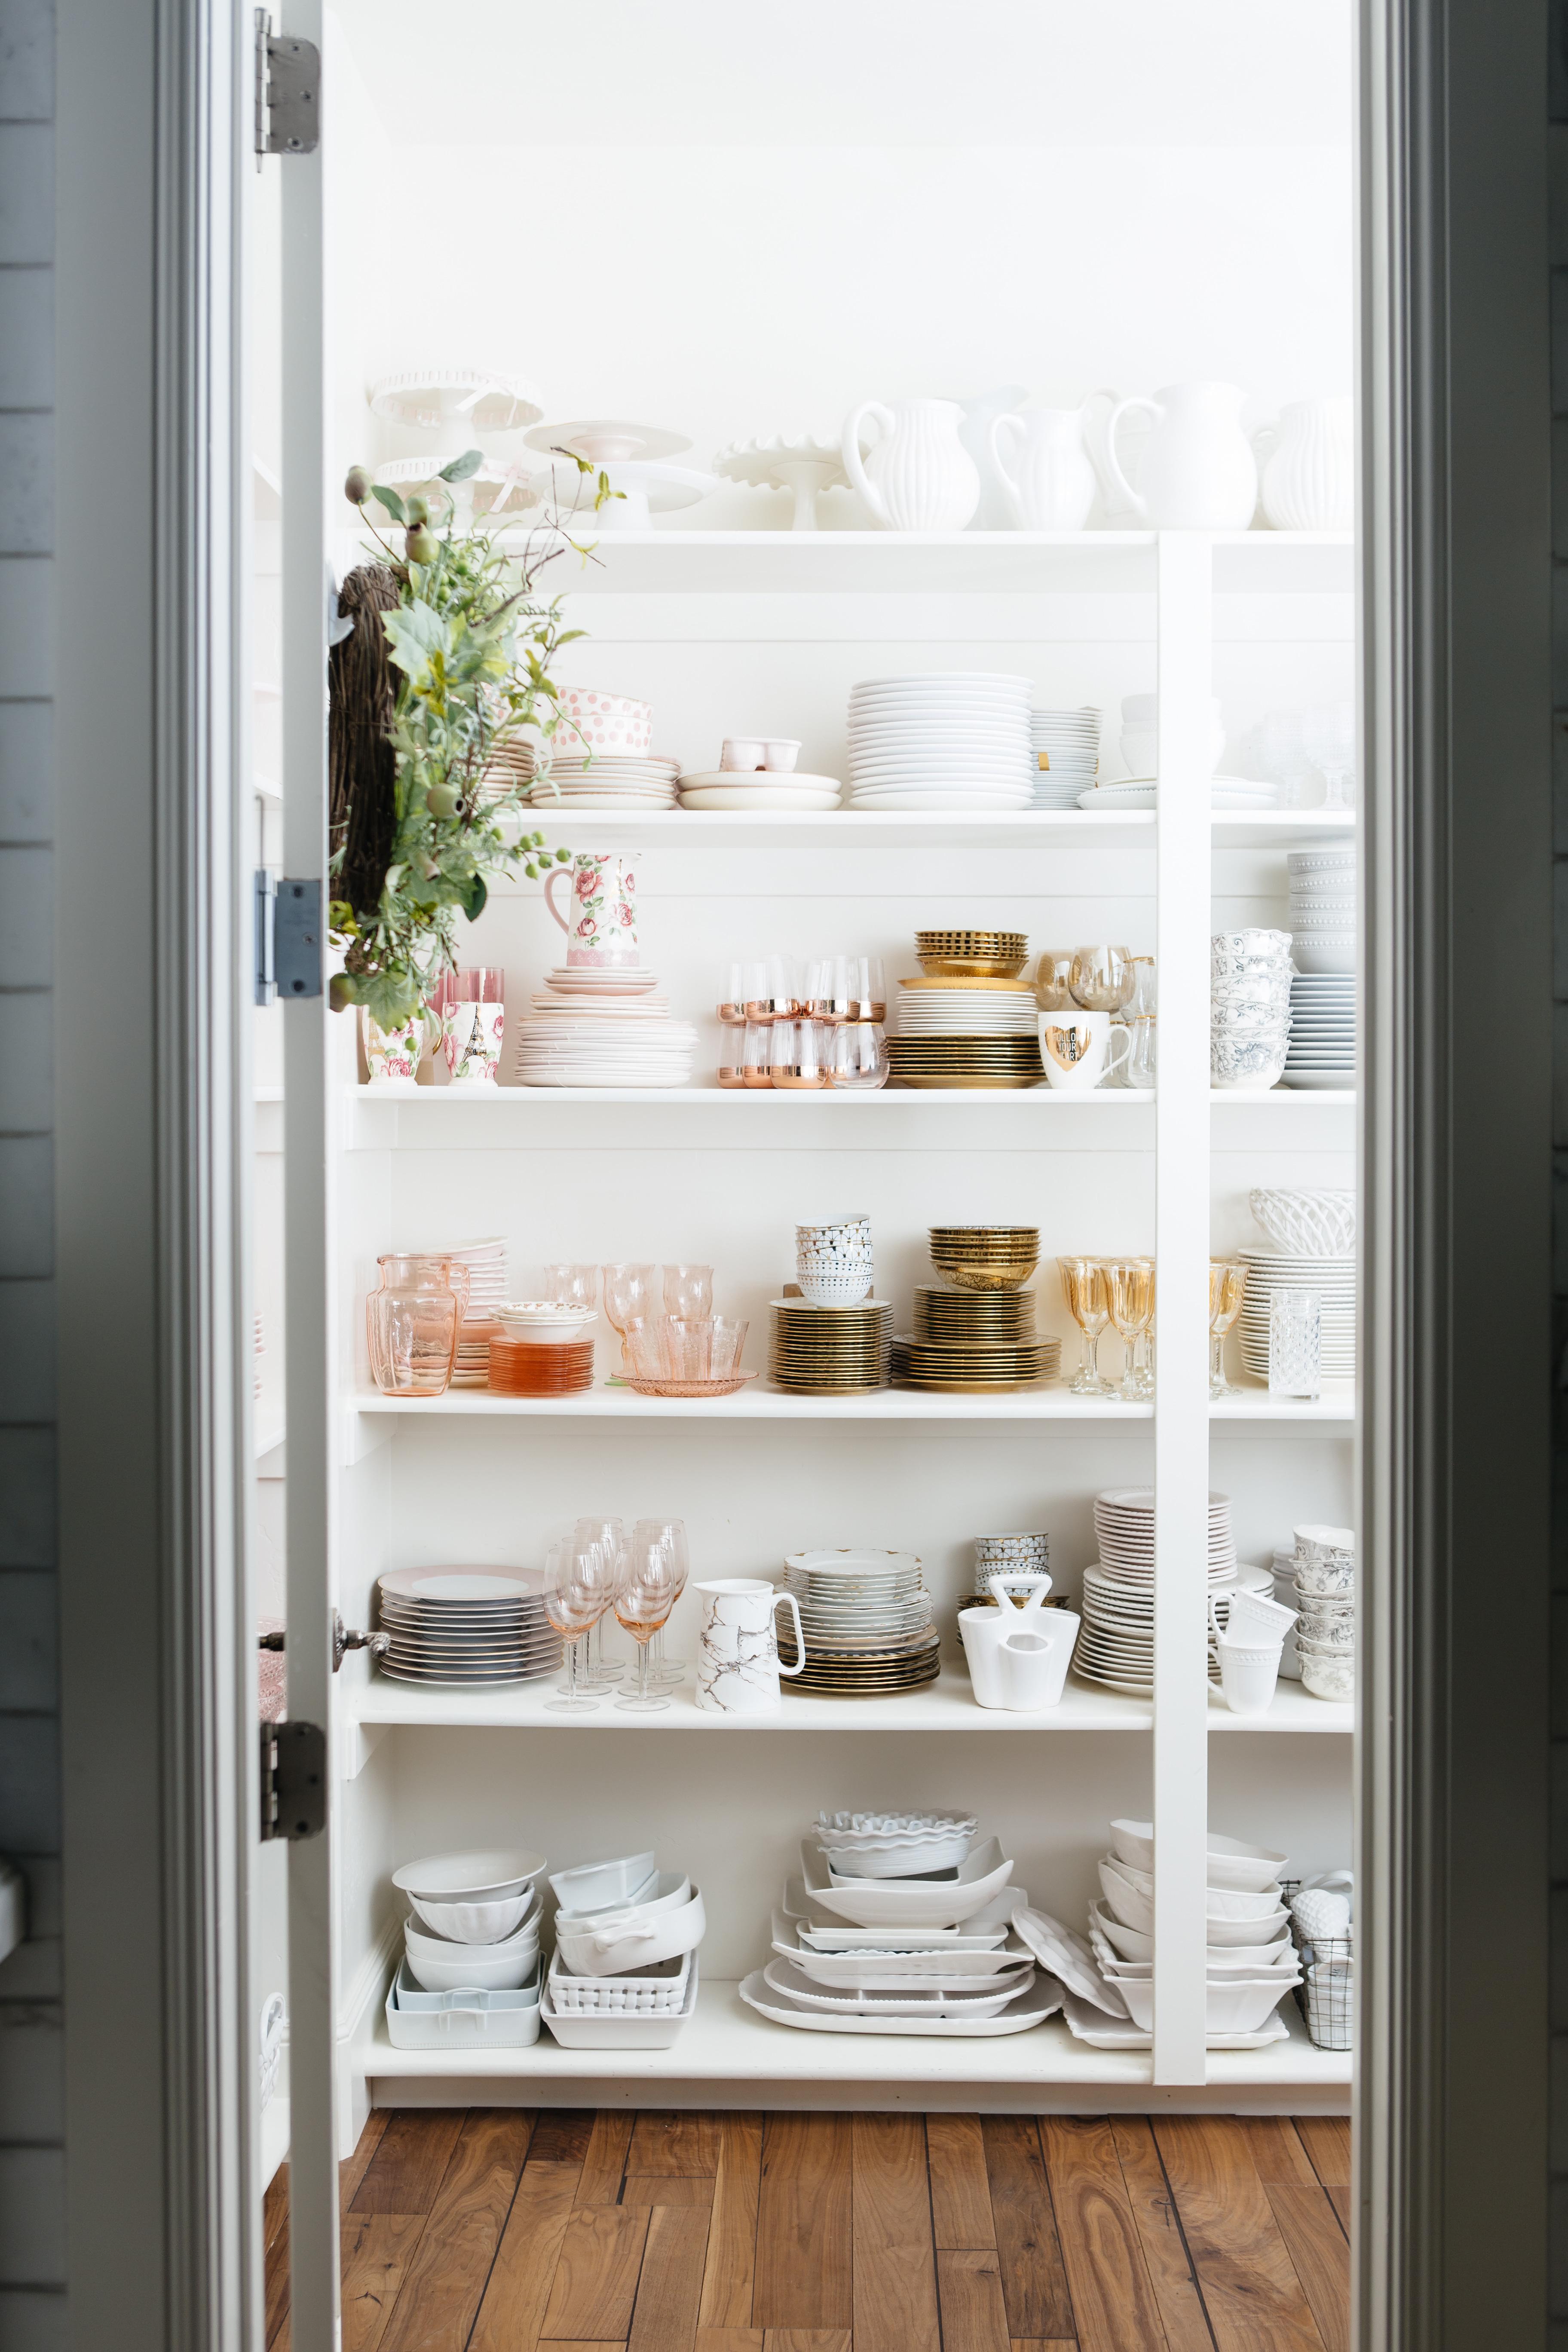 Pantry Organization For Dish Ware